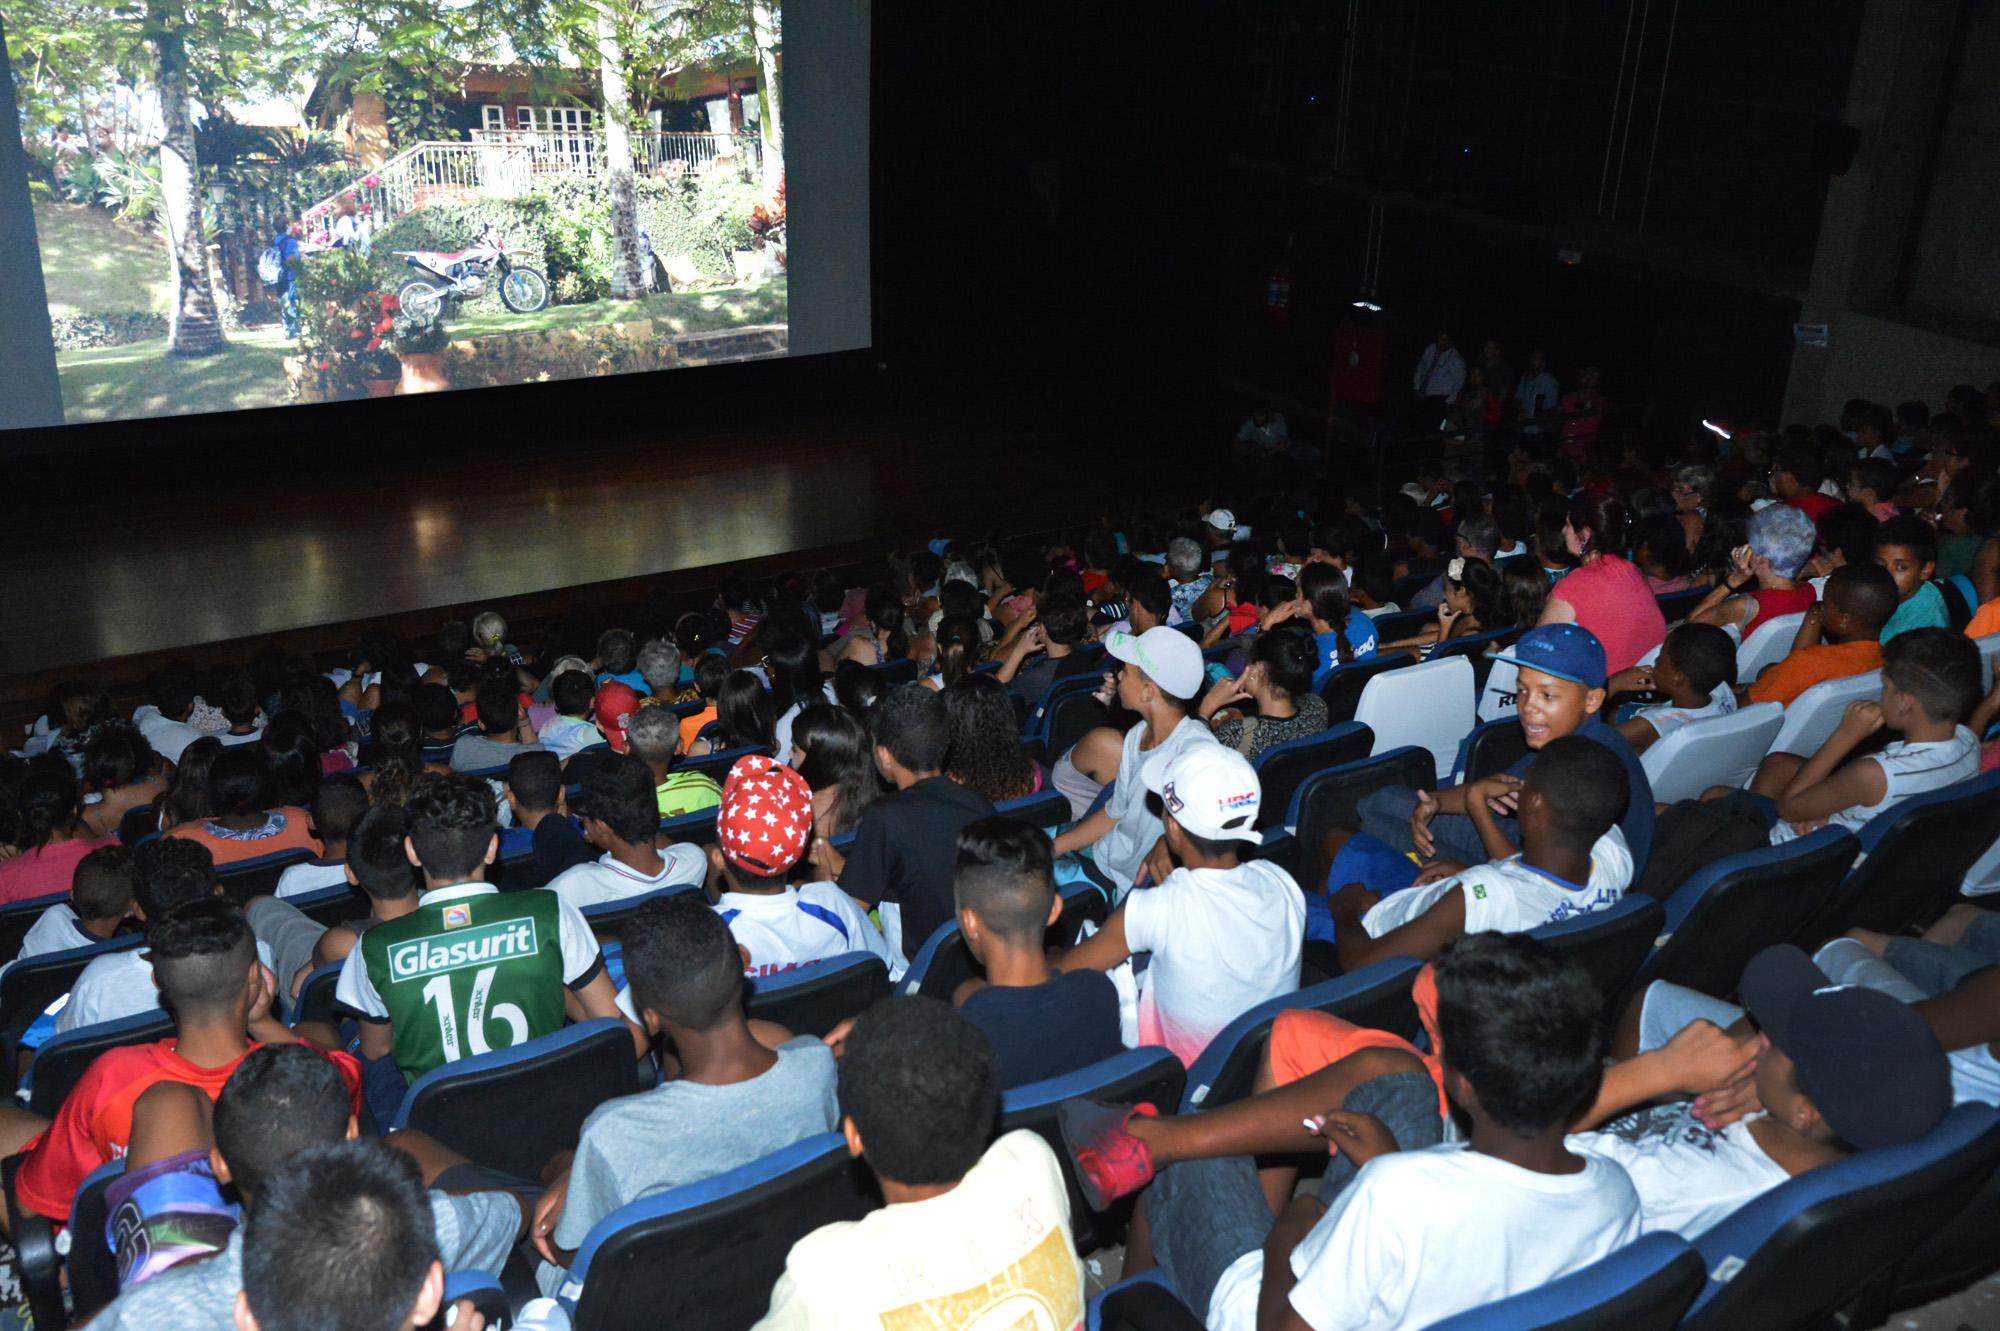 Circuito Sp Cine : Cinema grátis nos bairros e r$ 8 nos centros culturais: confira o